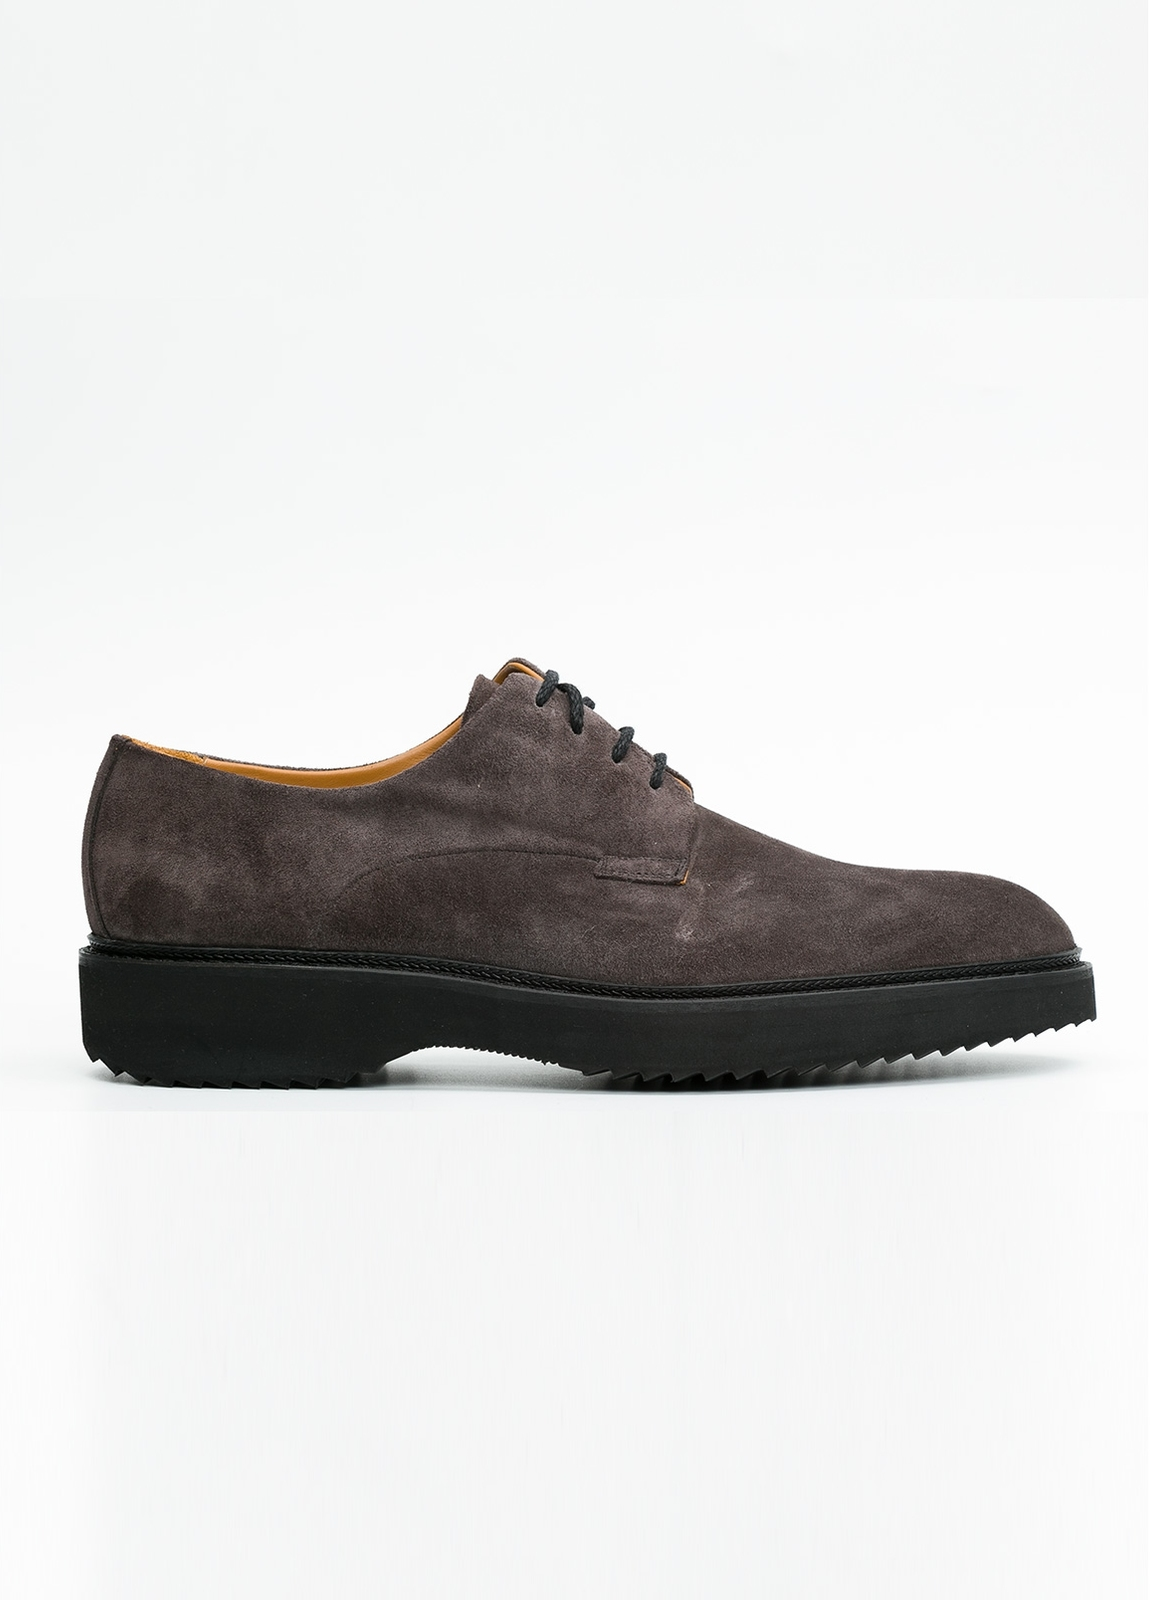 Zapato Sport Wear color gris. 100% Serraje.